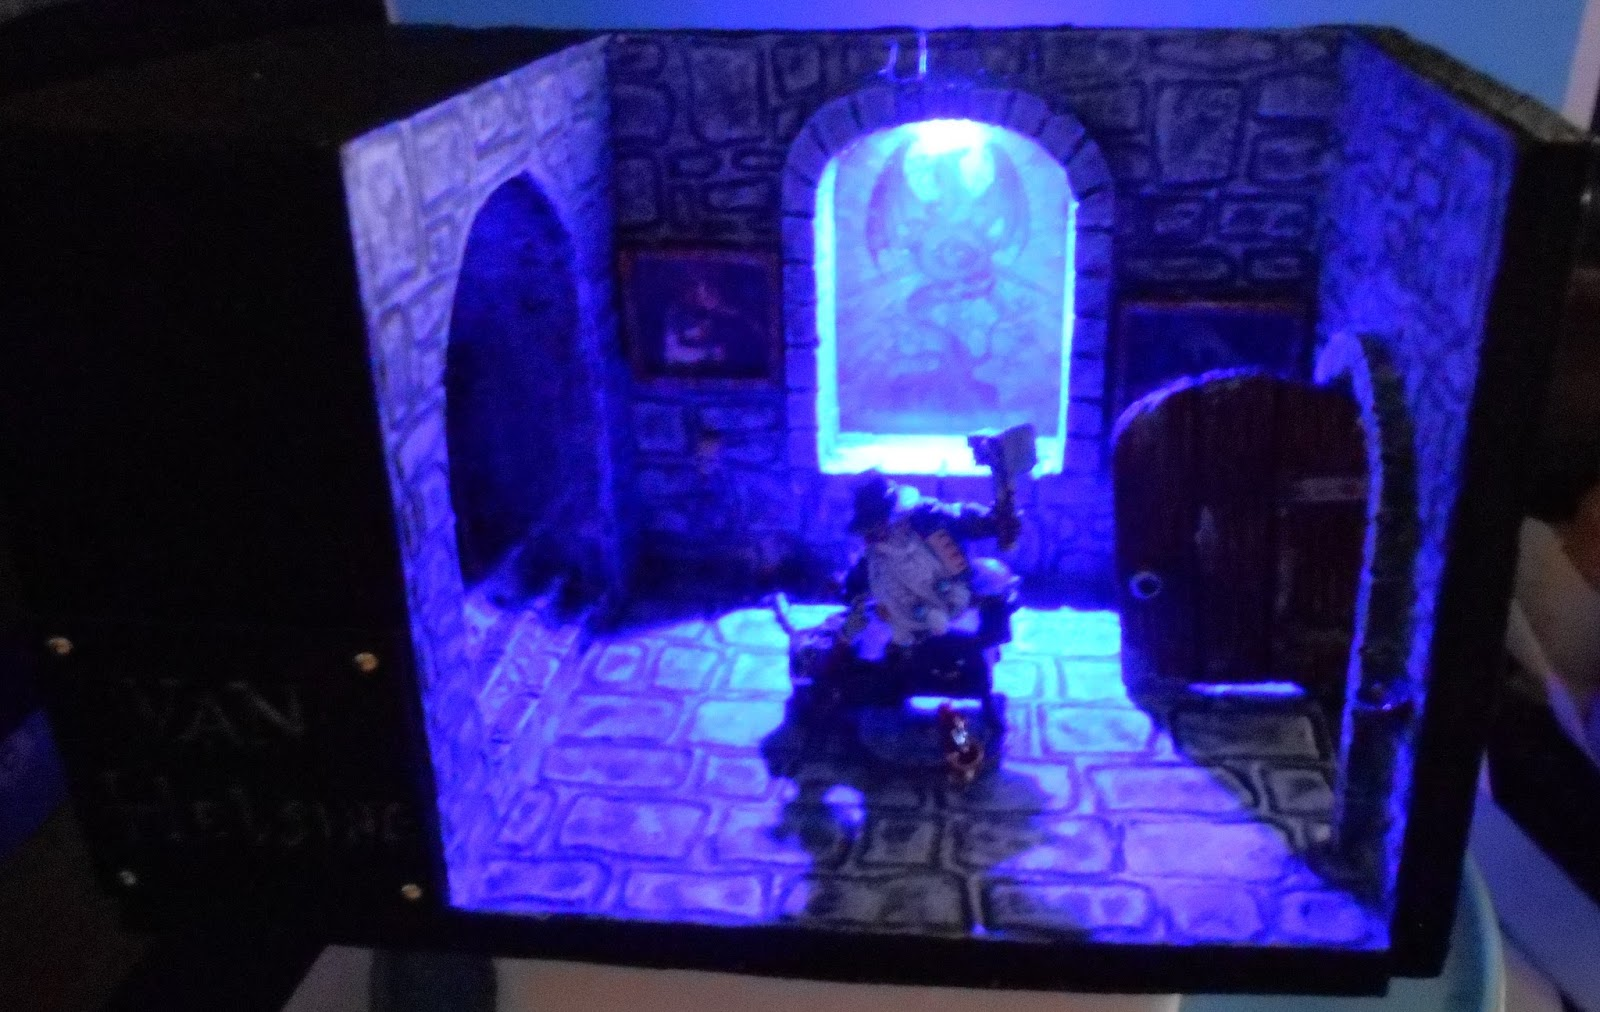 Grombrindal VS Dracula (Van Helsing Tribute) DSCN1393